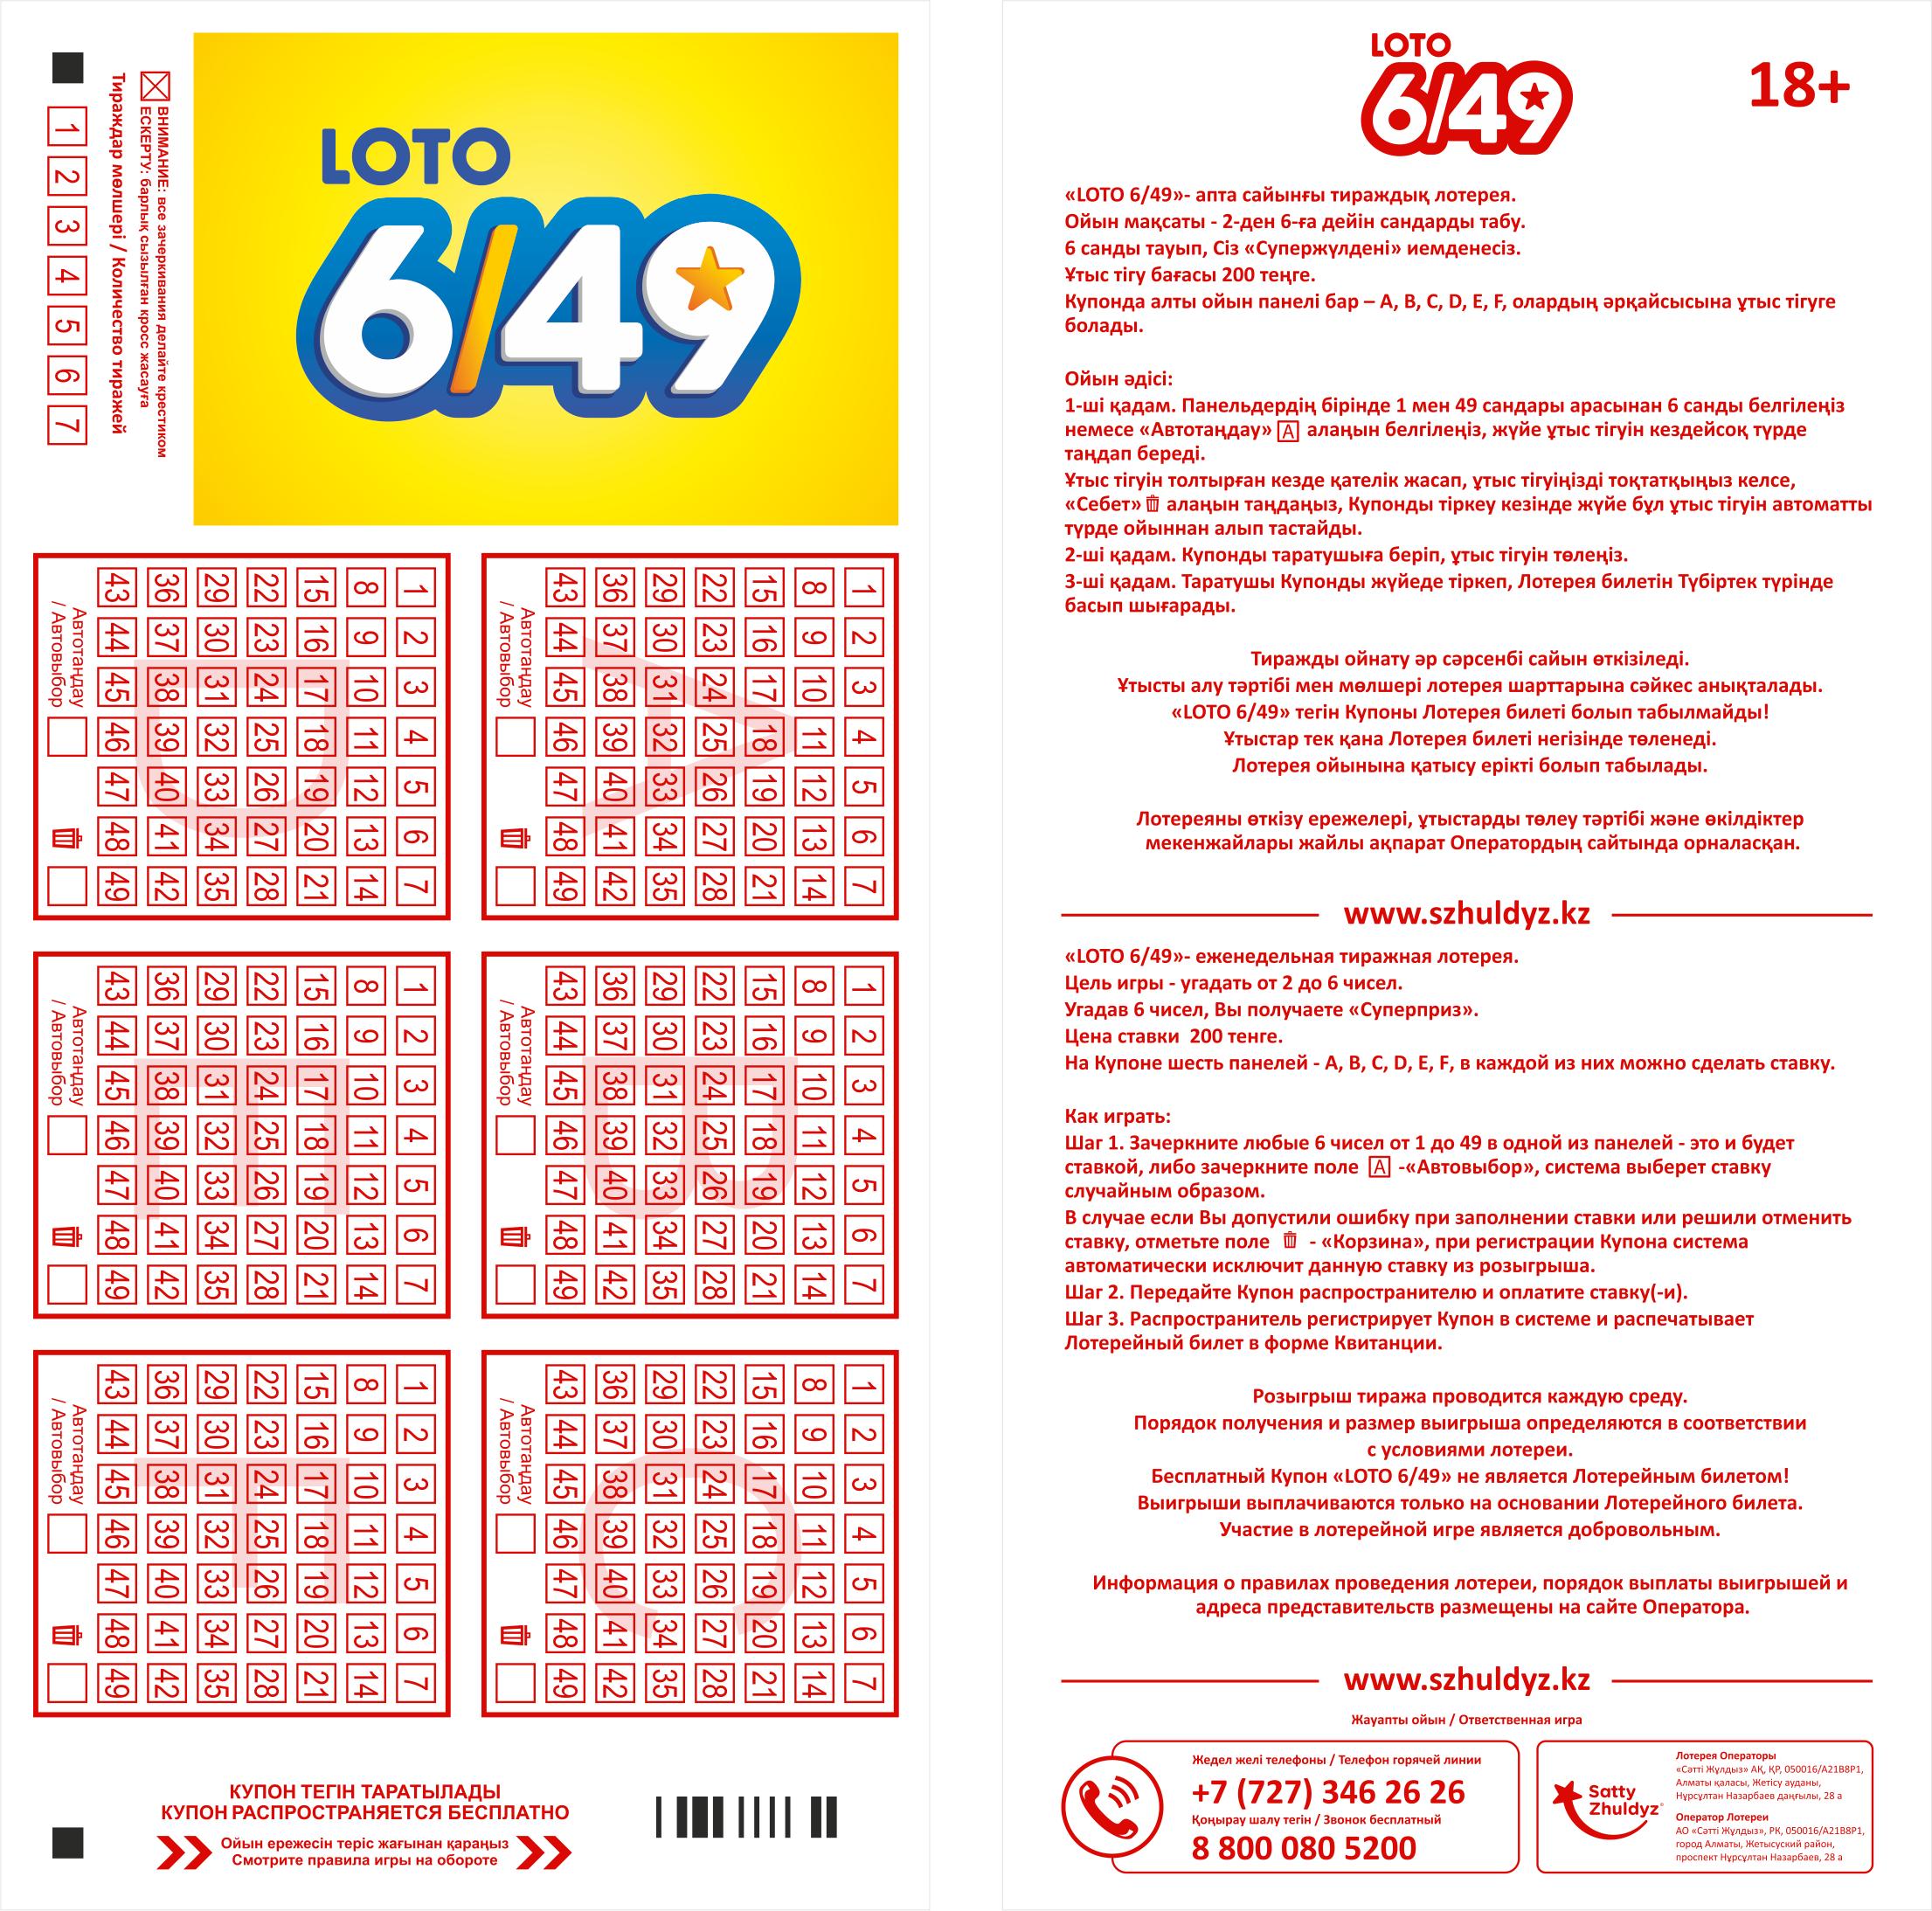 Лотерея telebingo, казахстан - timelottery